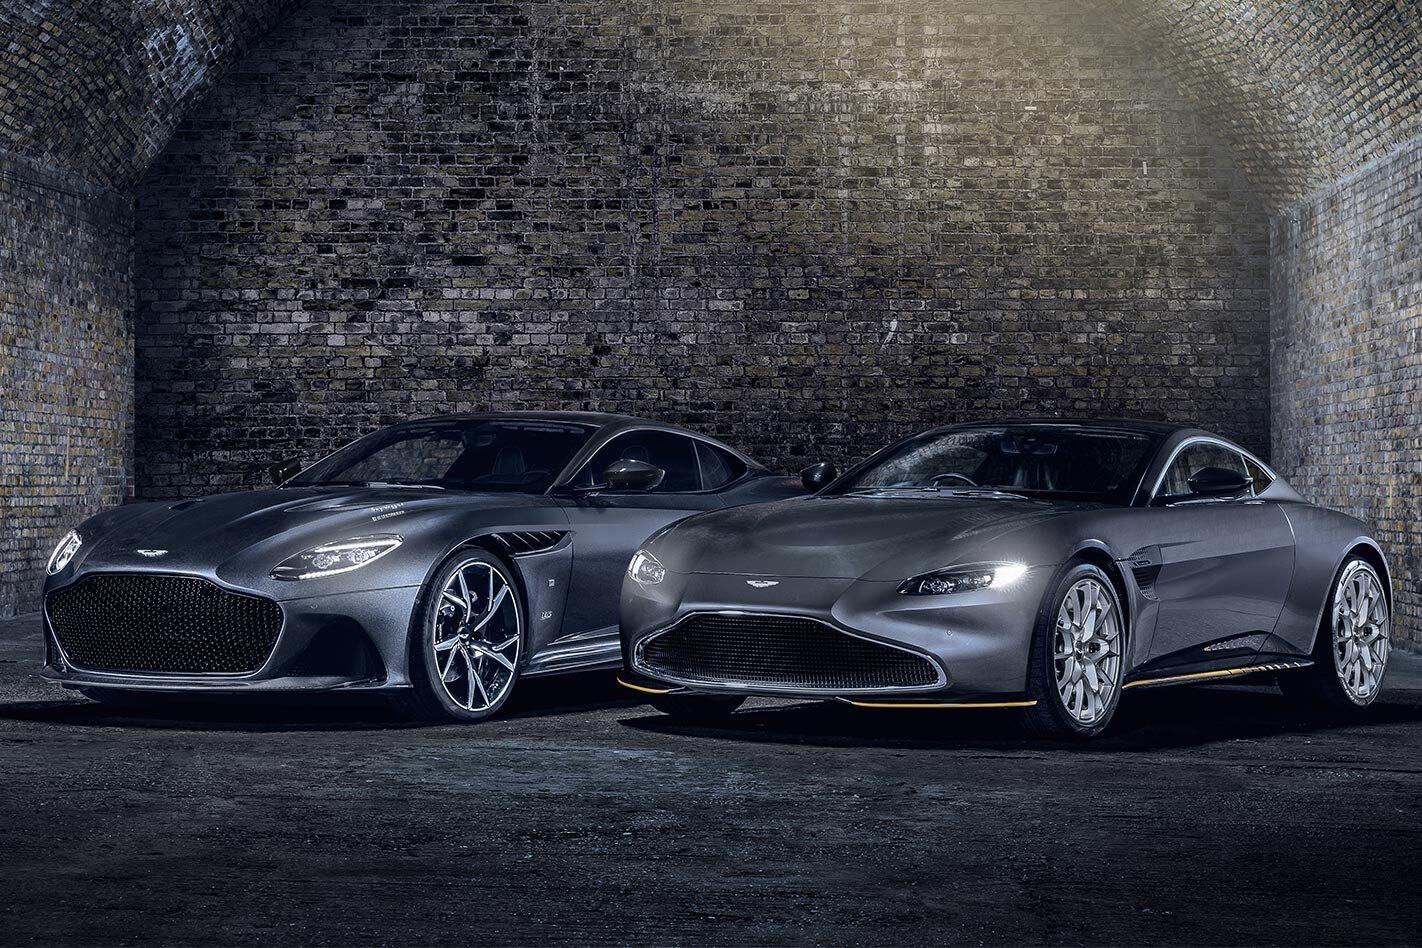 Aston Martin Vantage DBS Superleggera 007 Editions